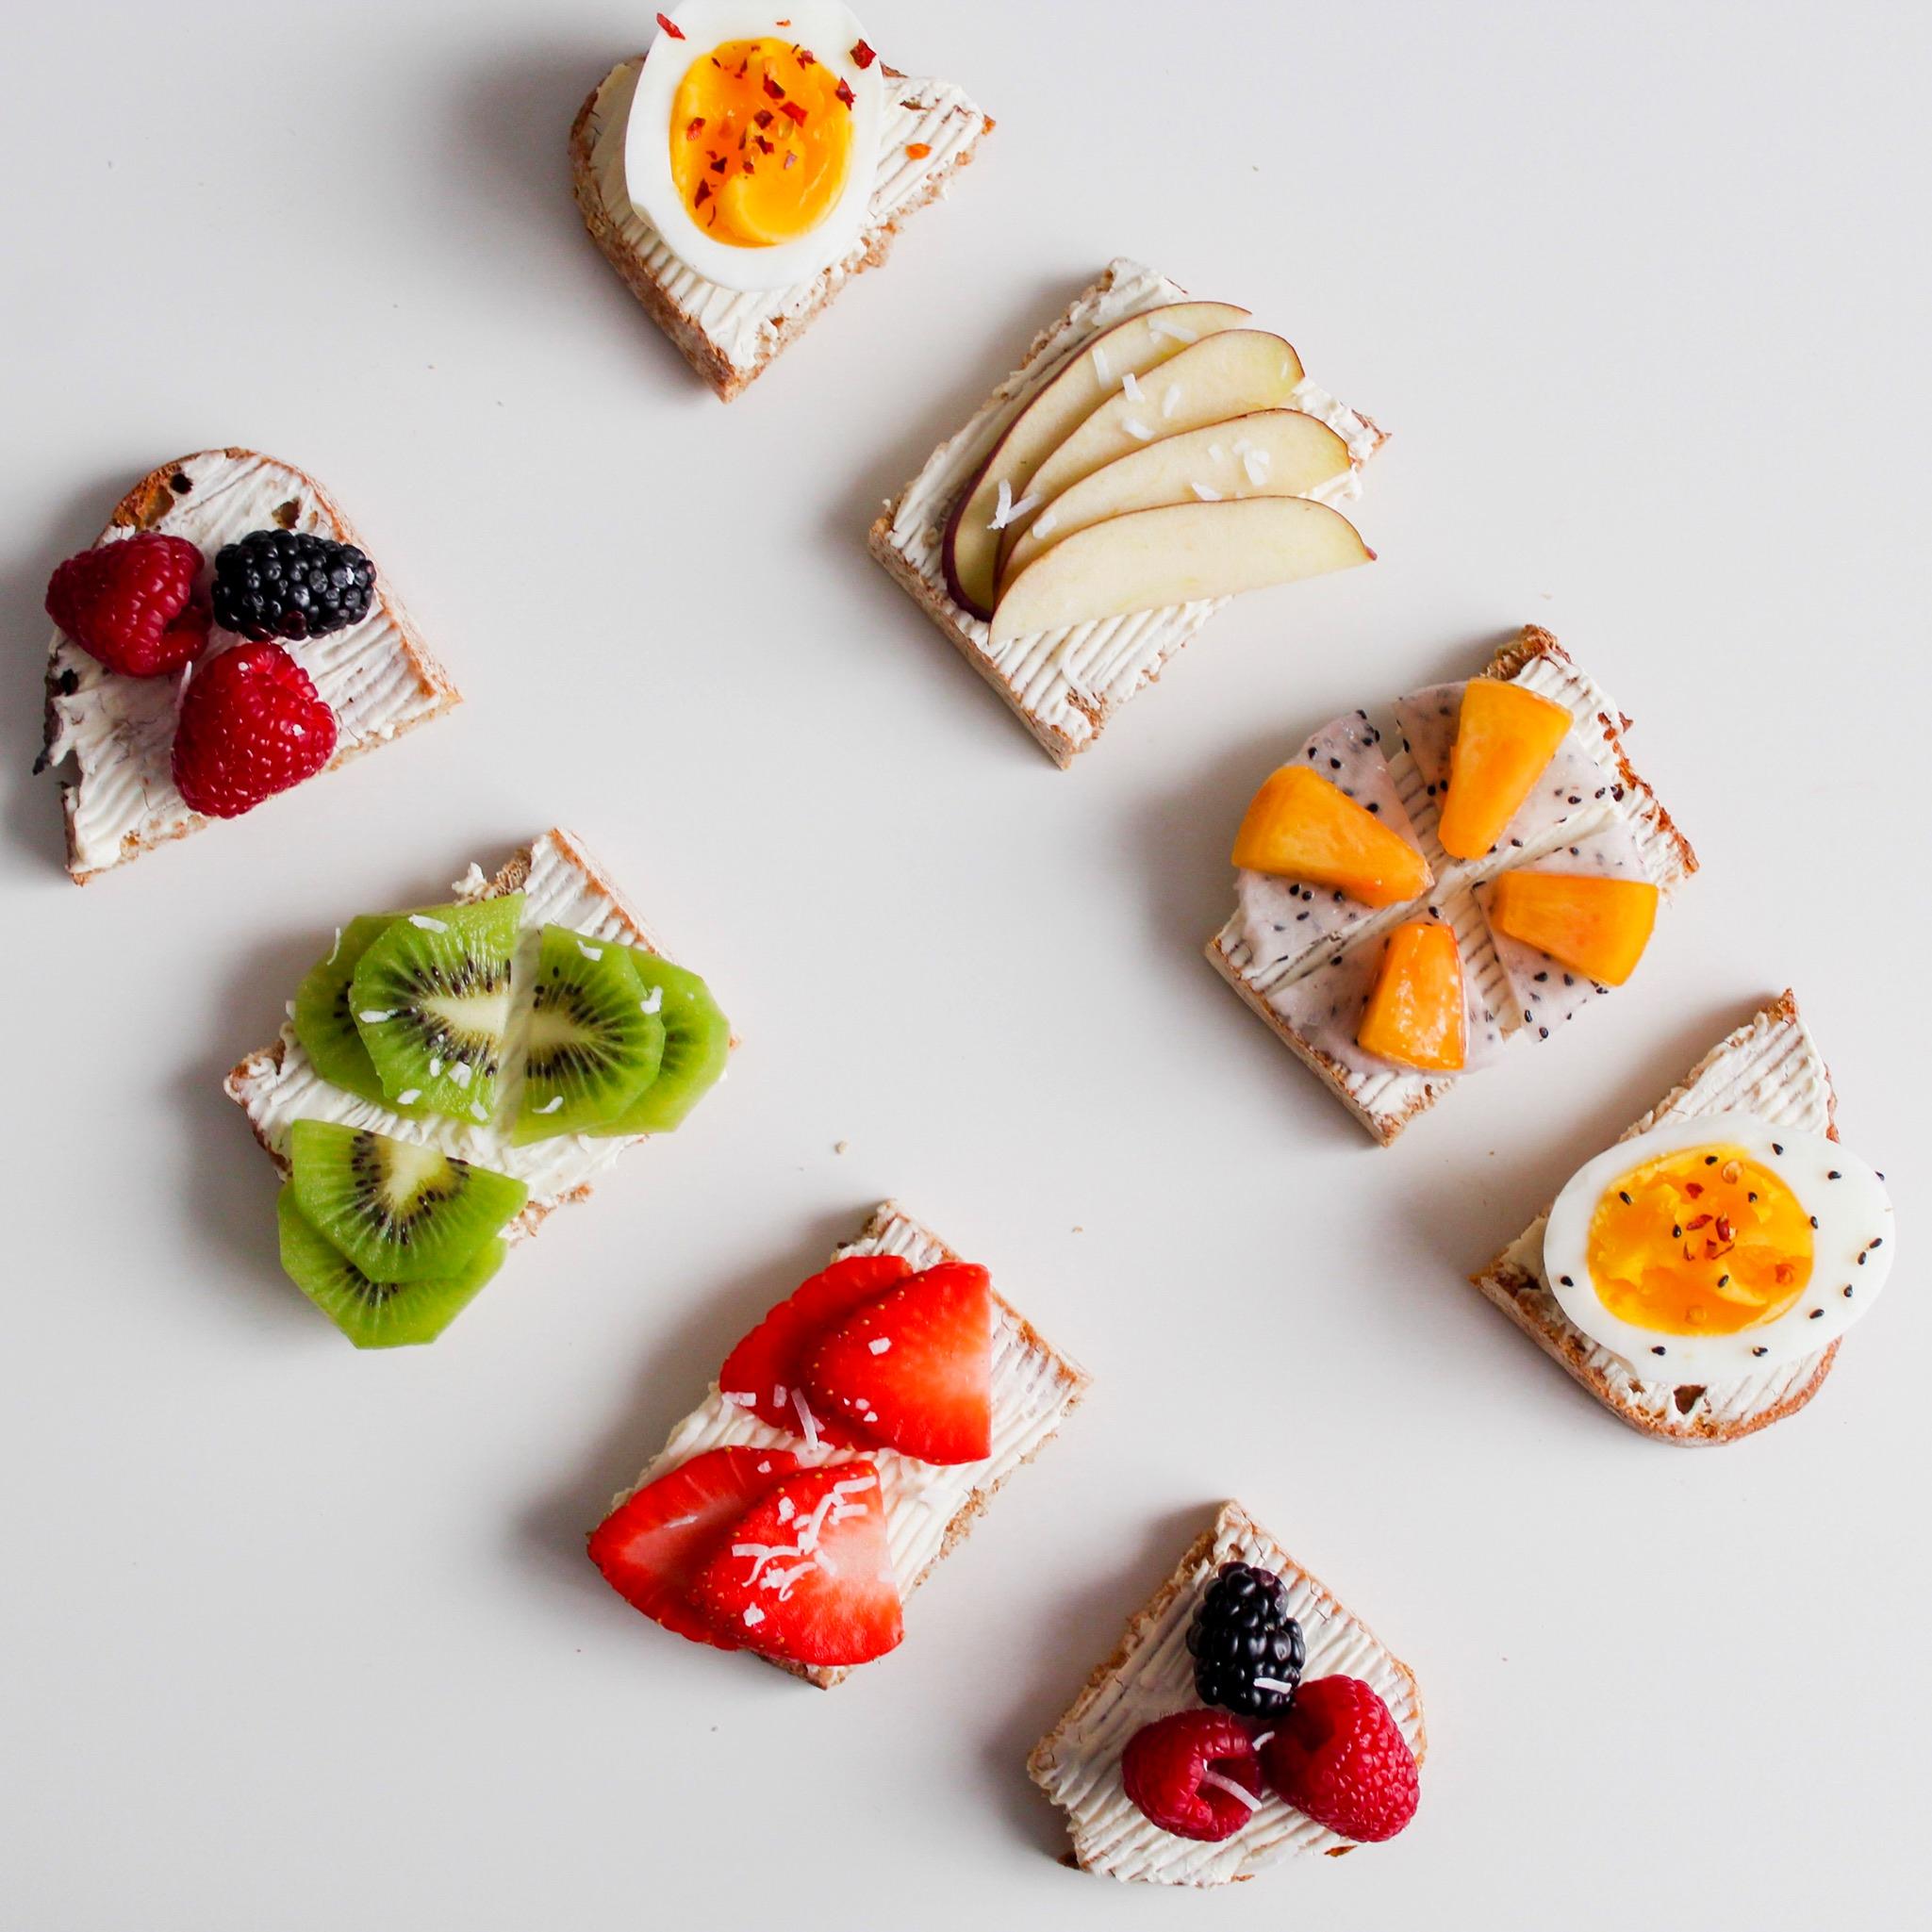 Canva - Assorted Foods.jpg